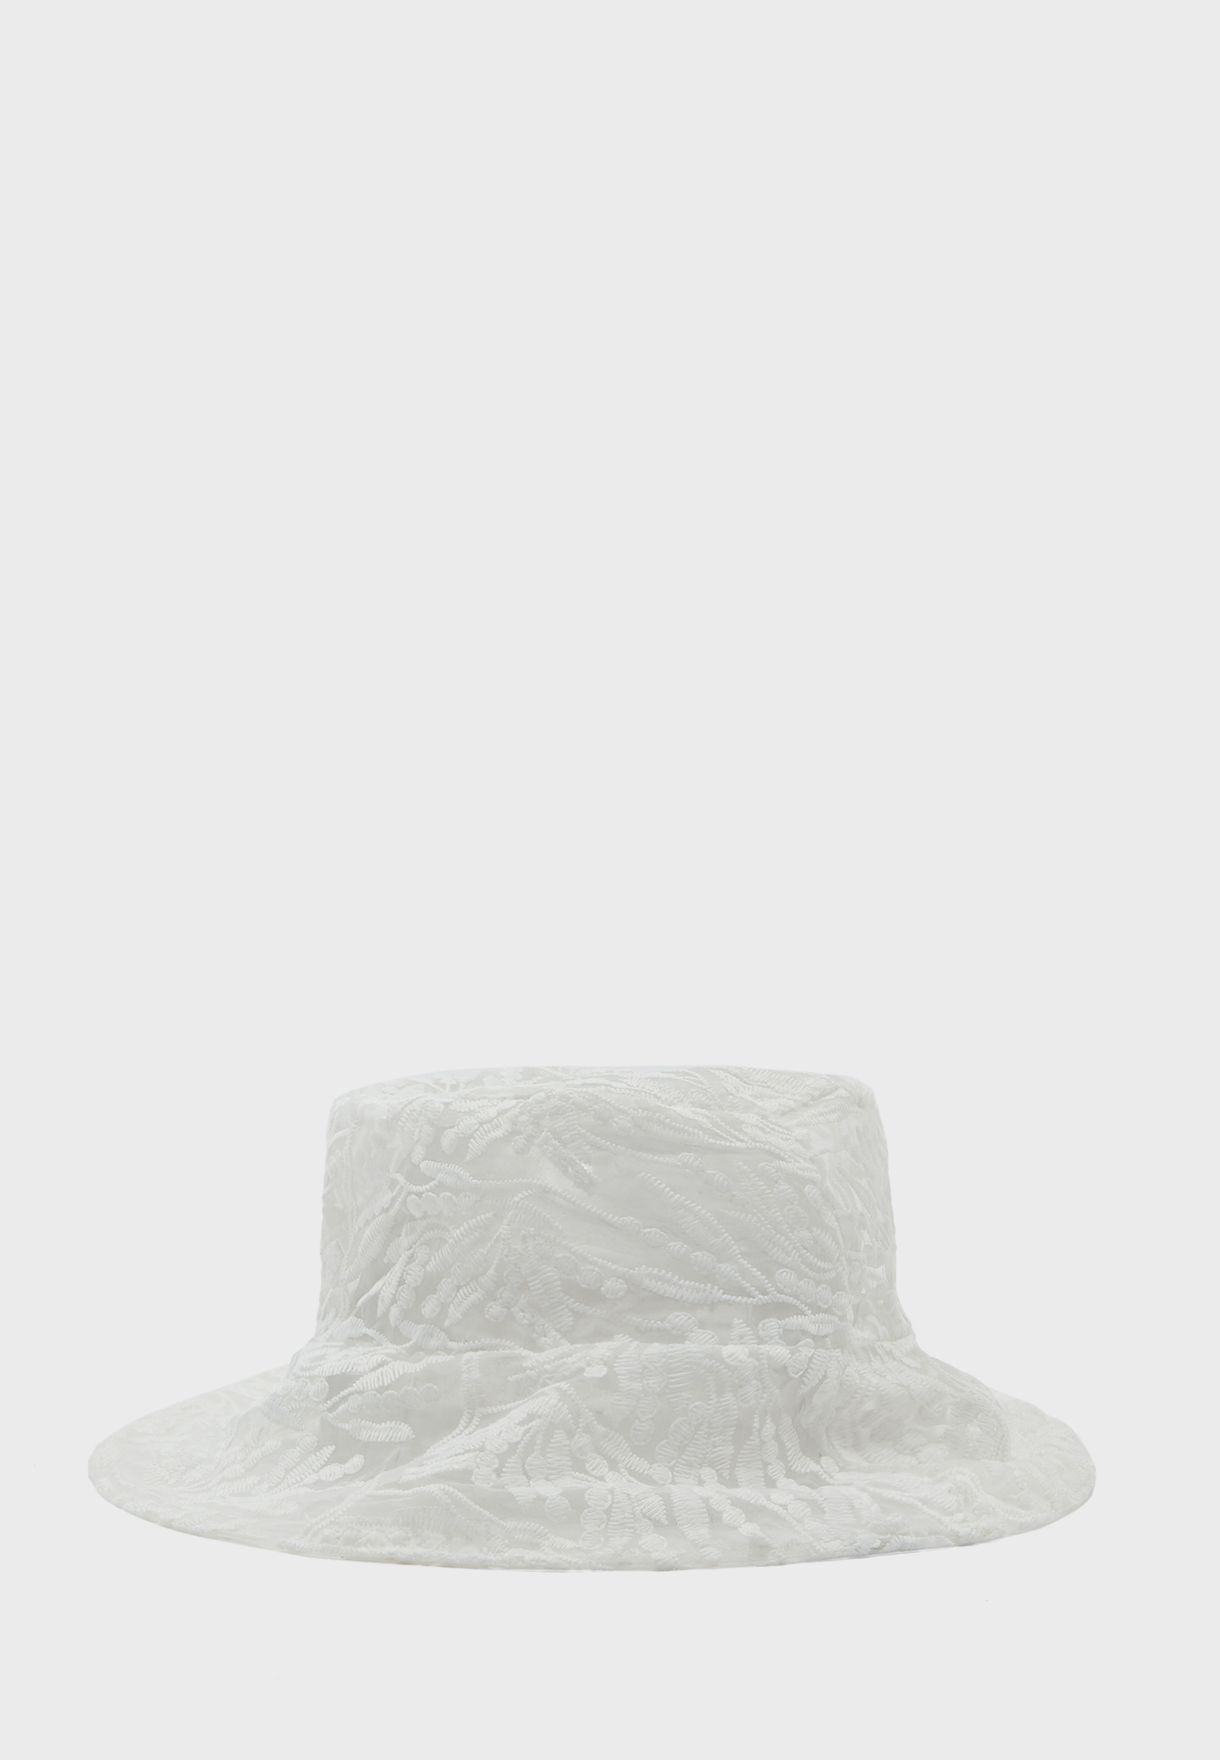 Sheer Patterned Bucket Hat